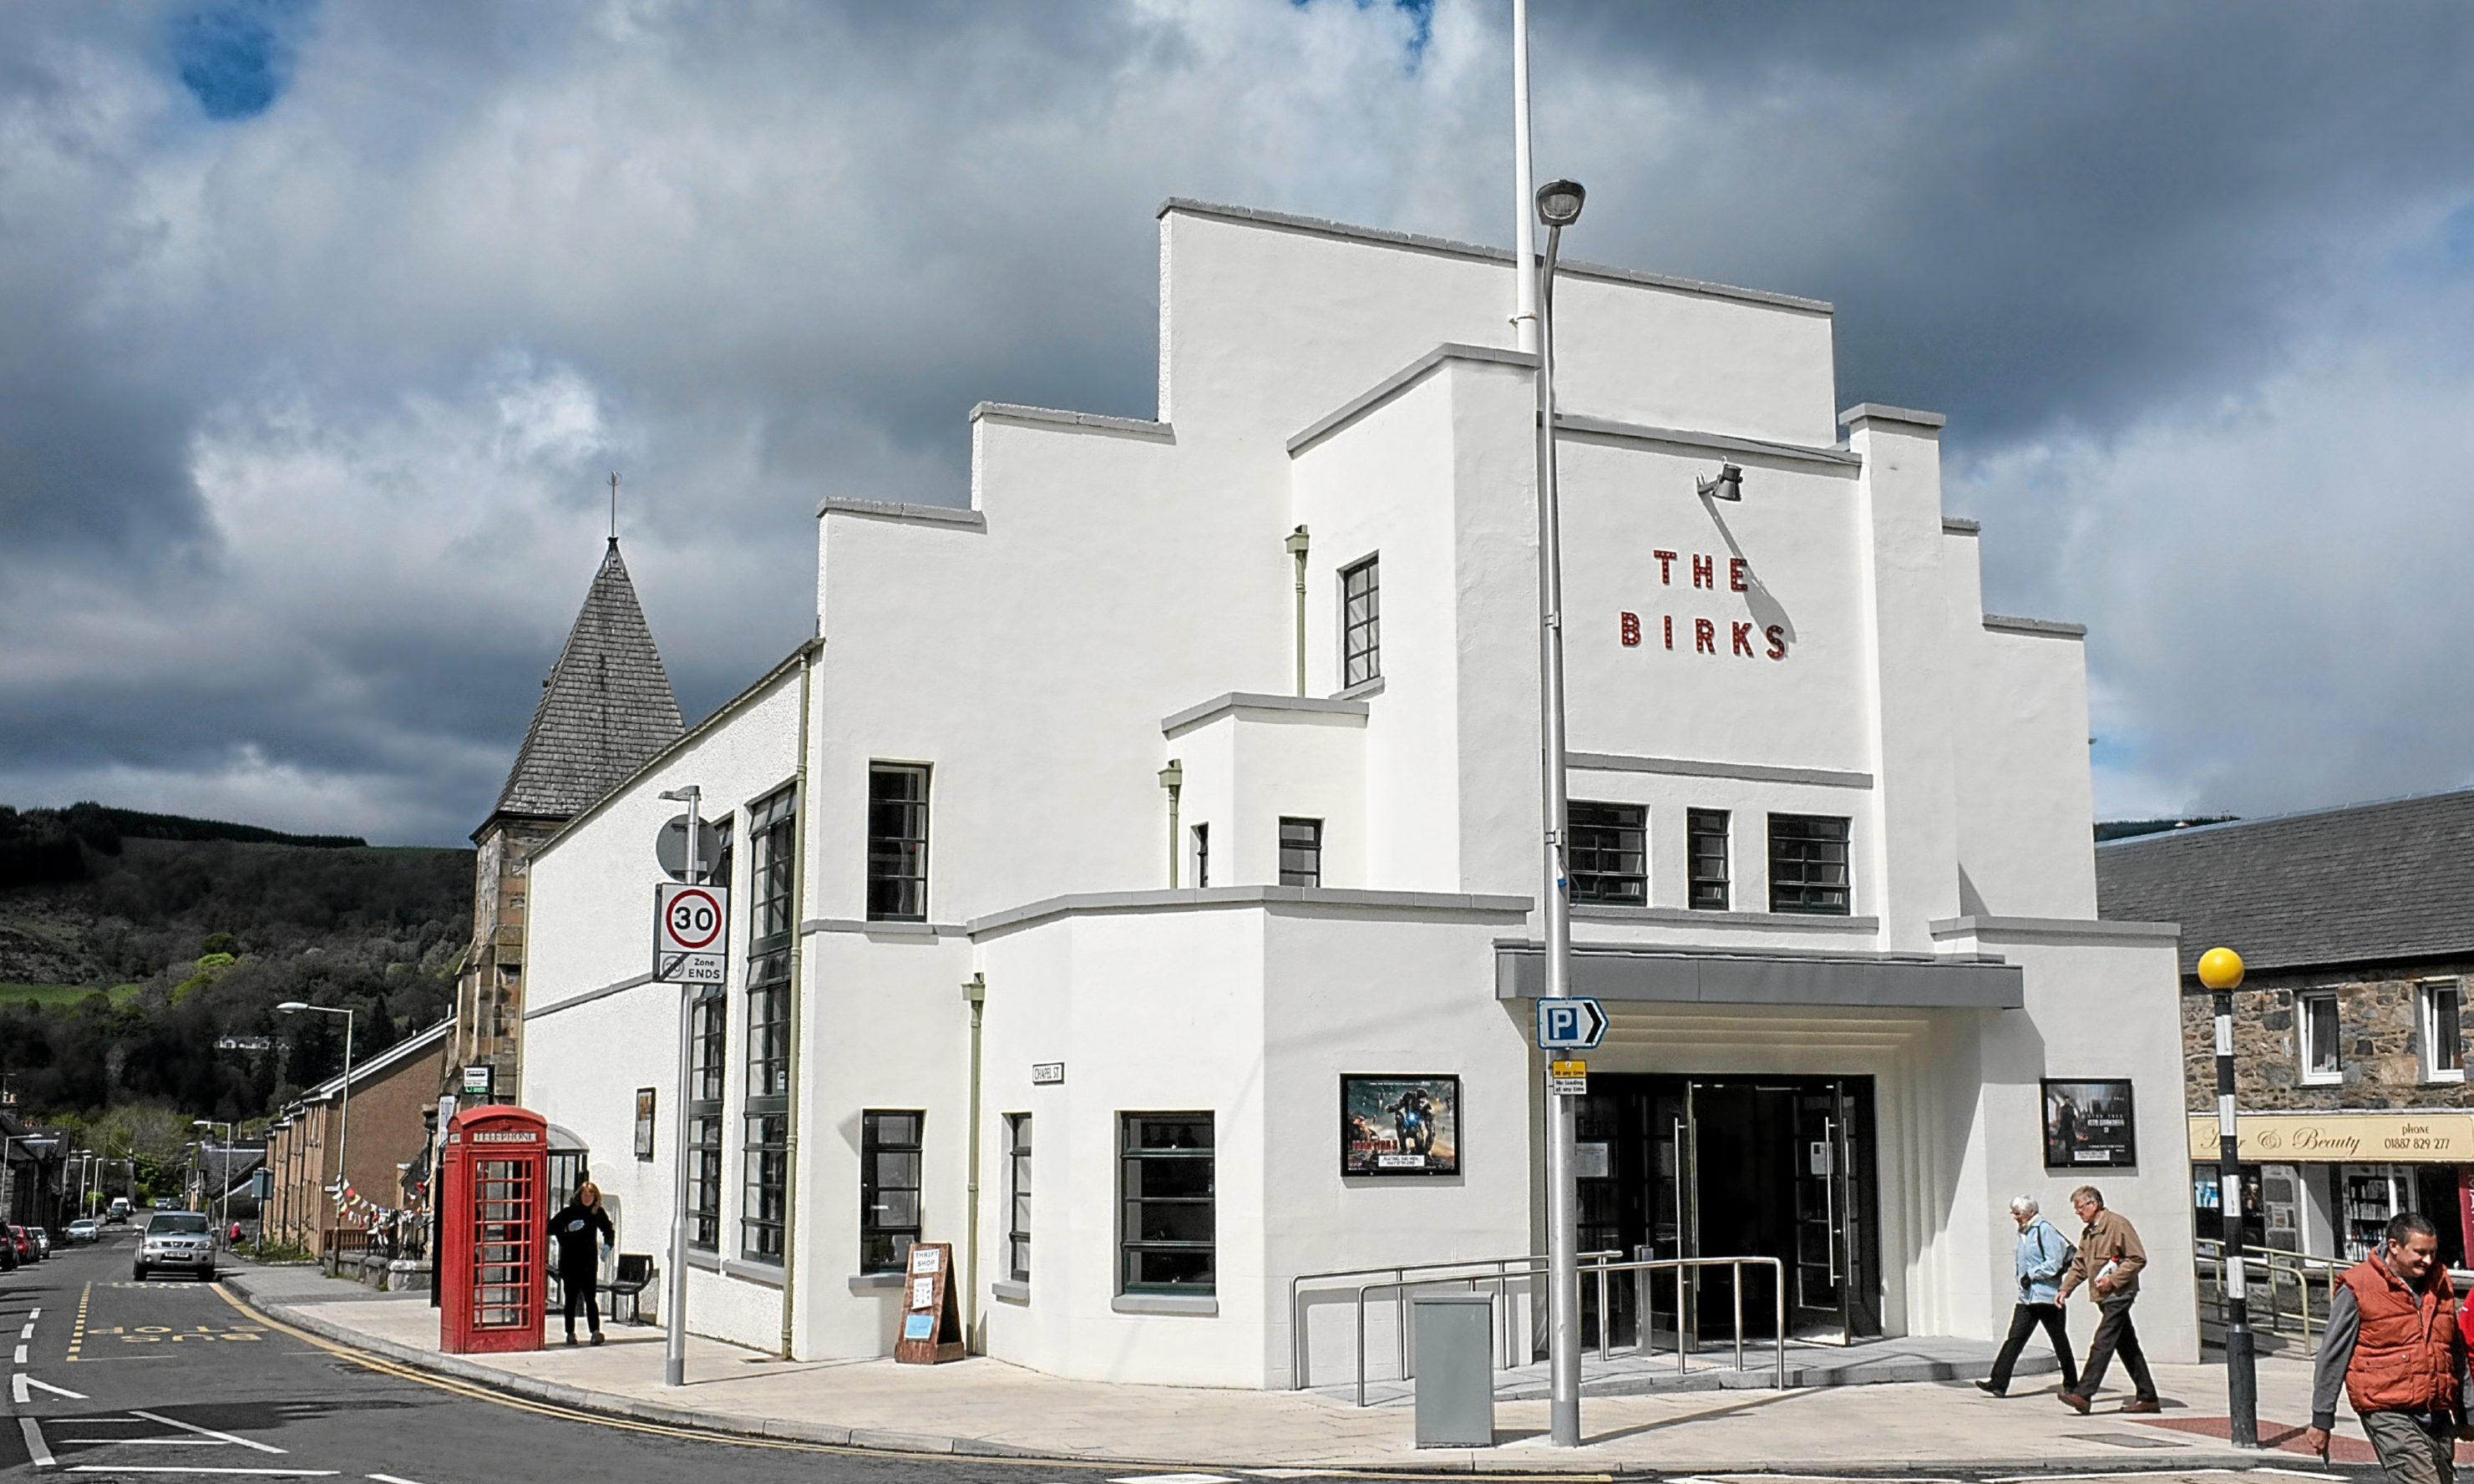 The Birks Cinema at Aberfeldy